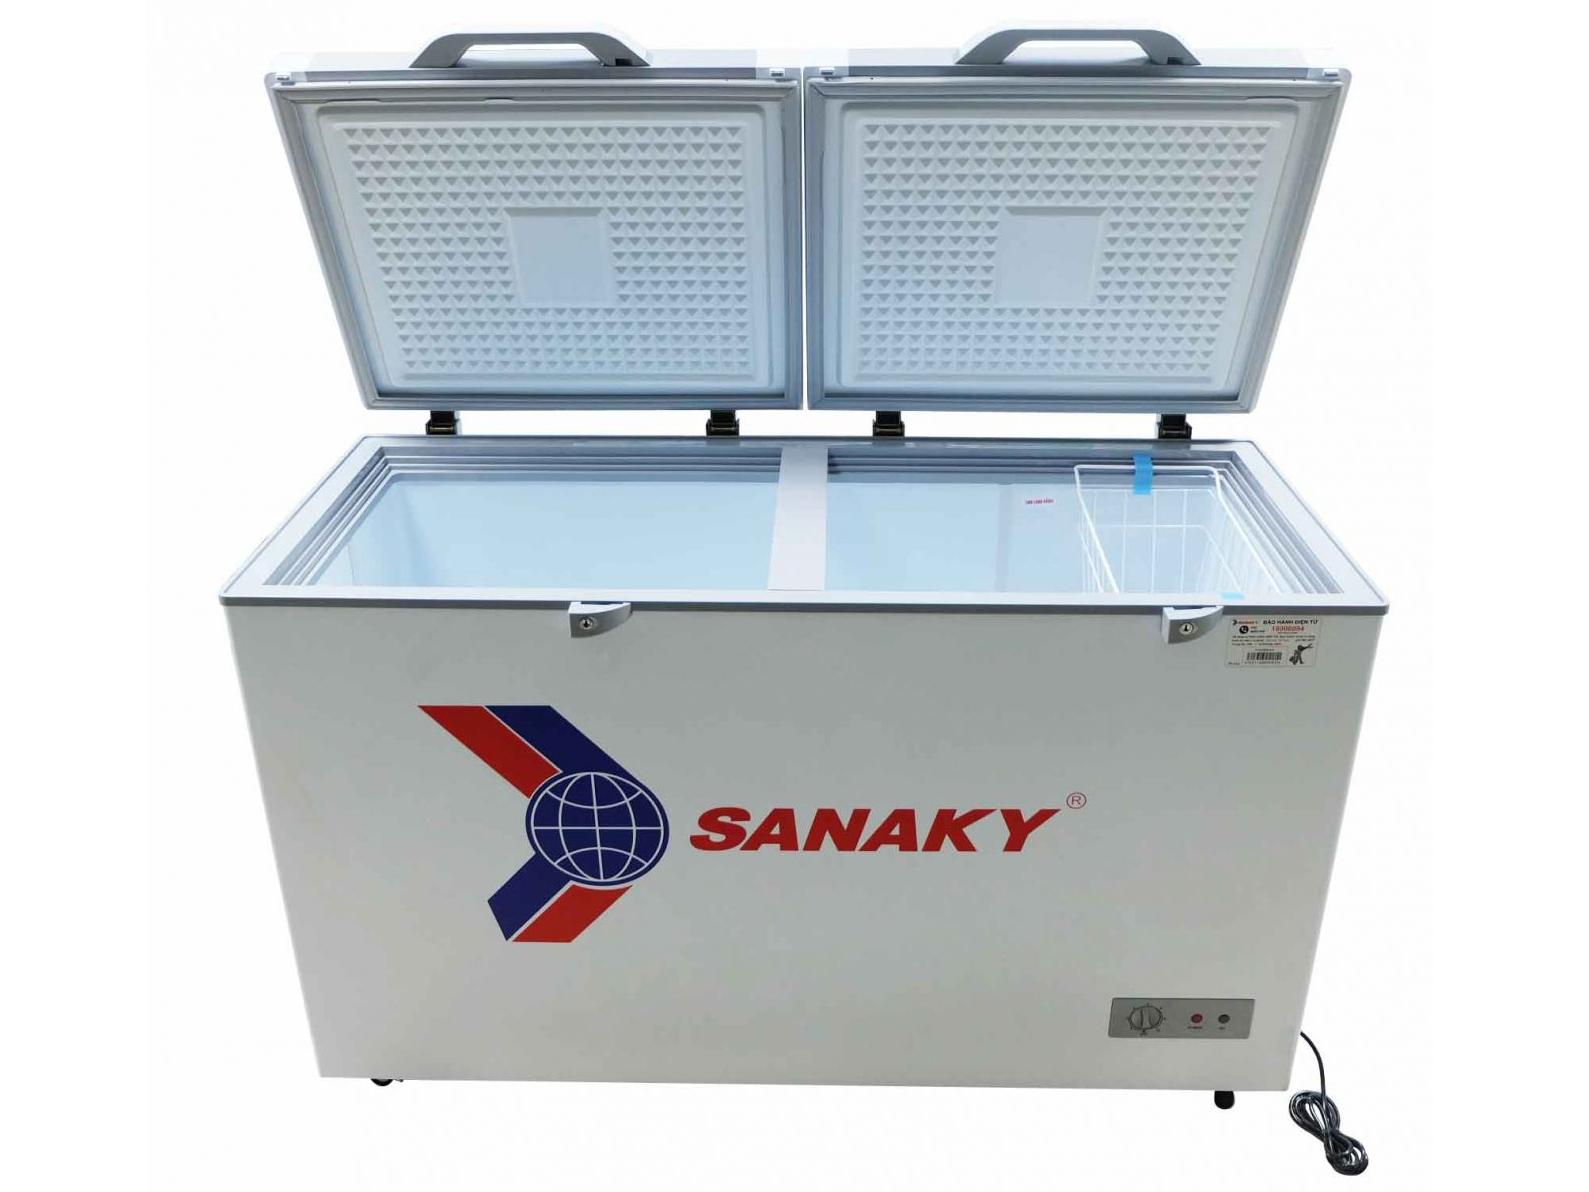 Sanaky VH 2899A2K